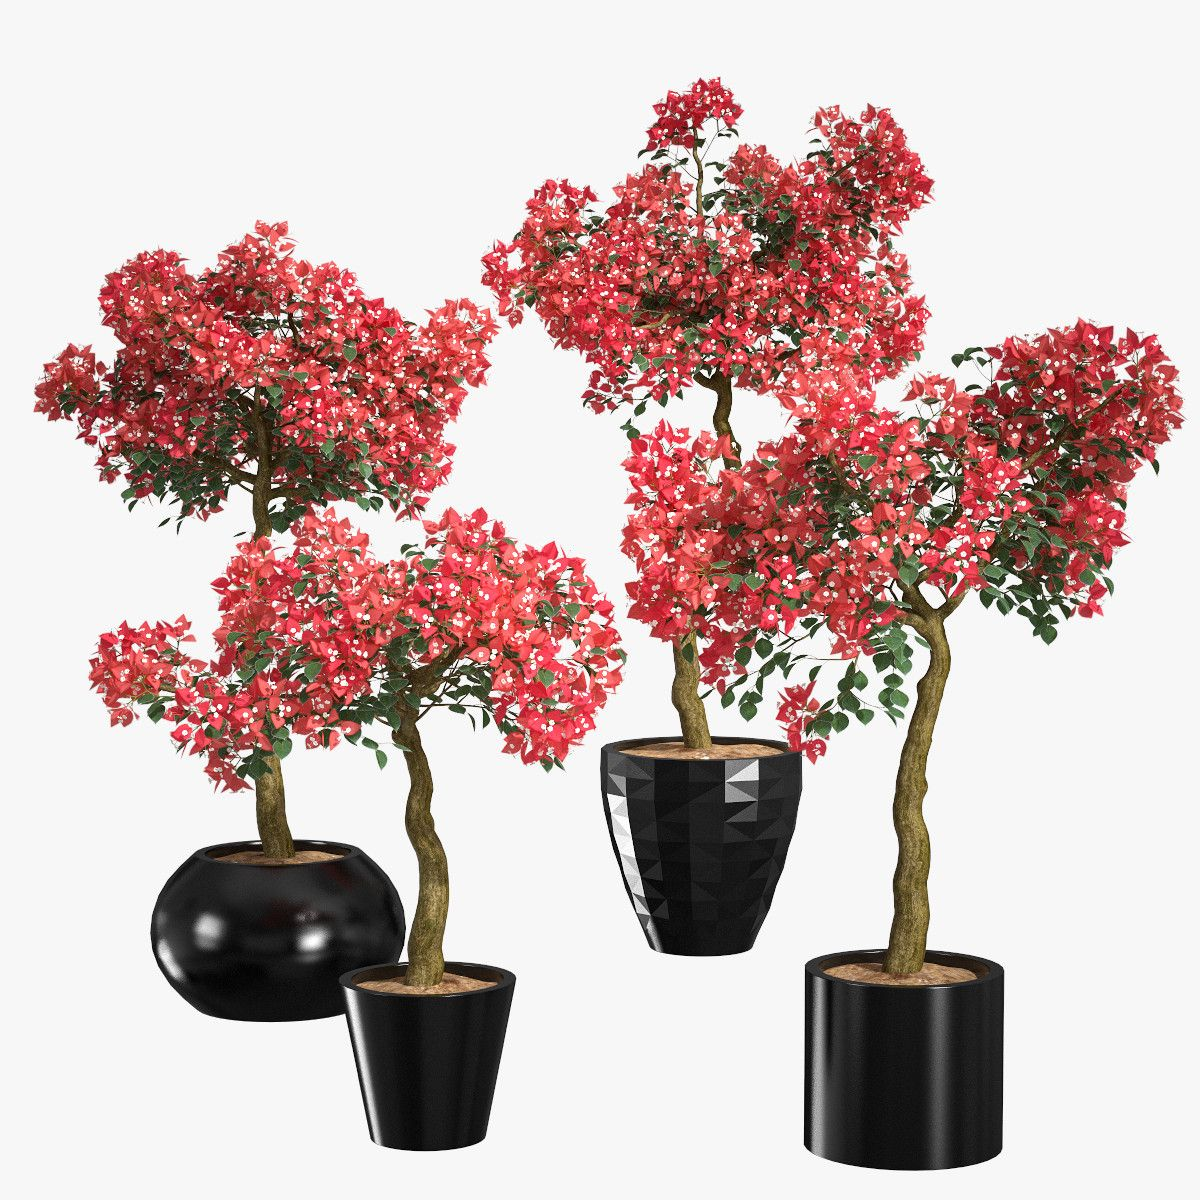 3d model set bougainvillea trees 1 | Неделя 17- деревья ...